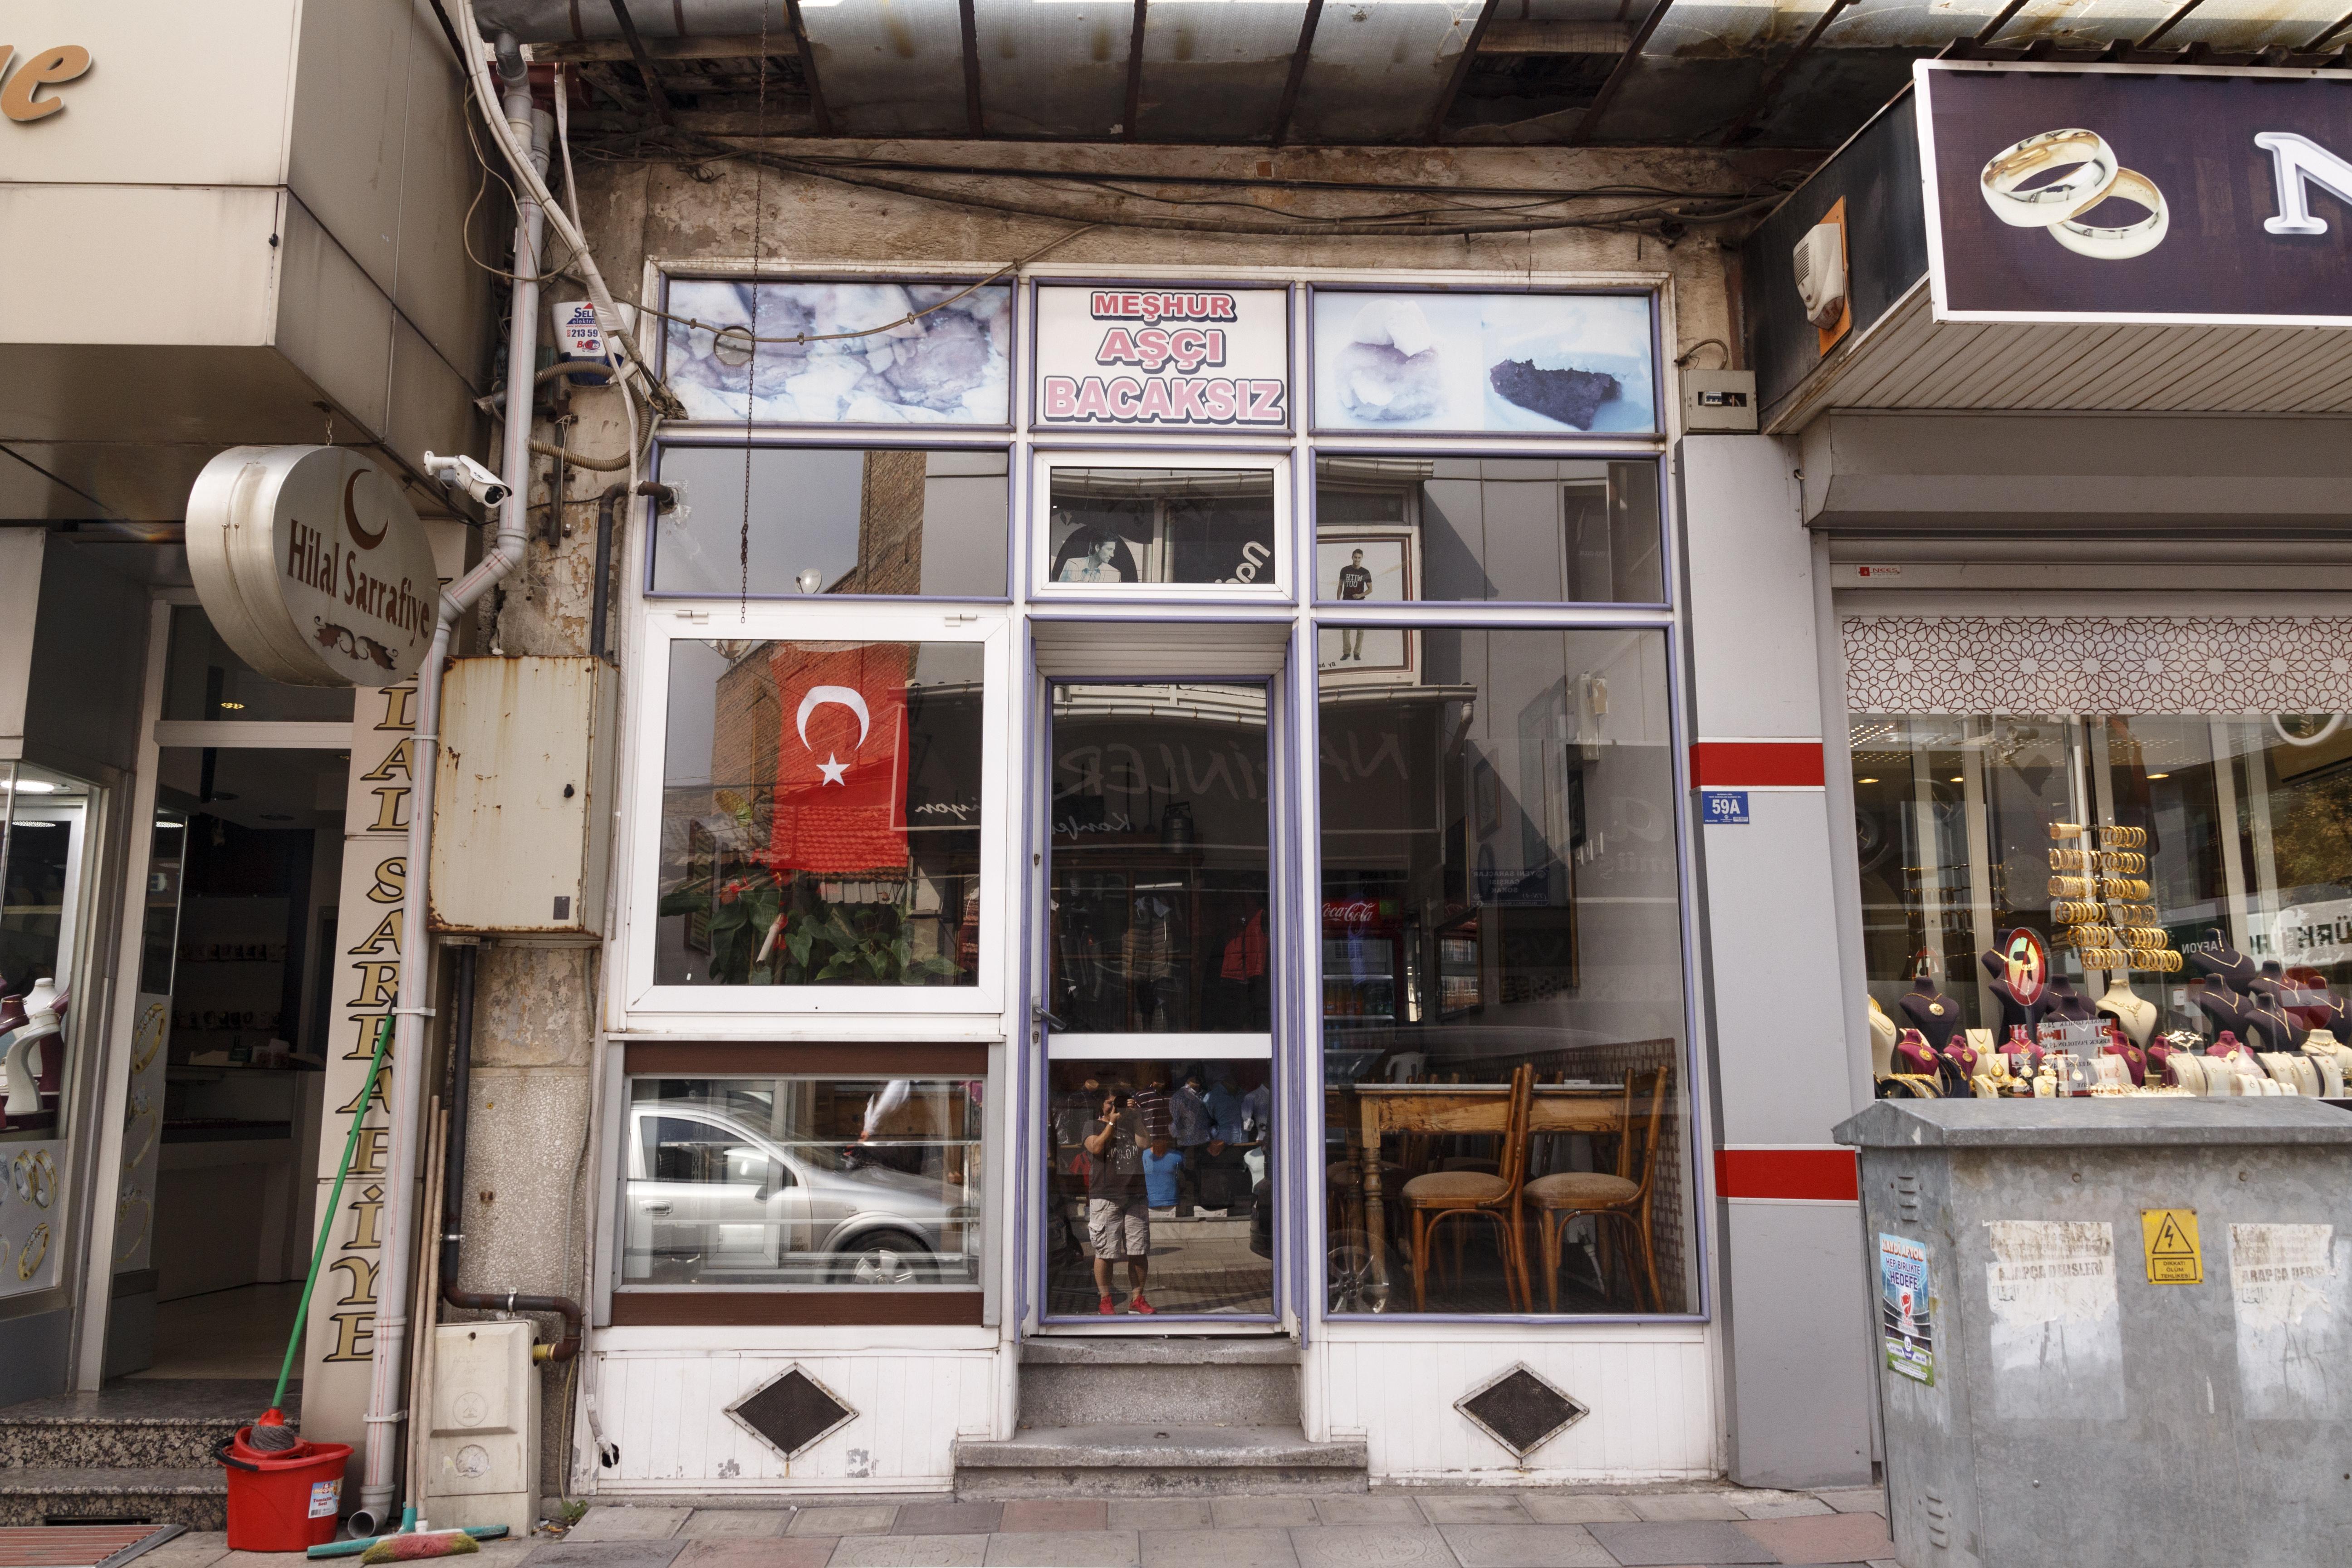 20170919_Afyon_AsciBacaksiz_Disardan